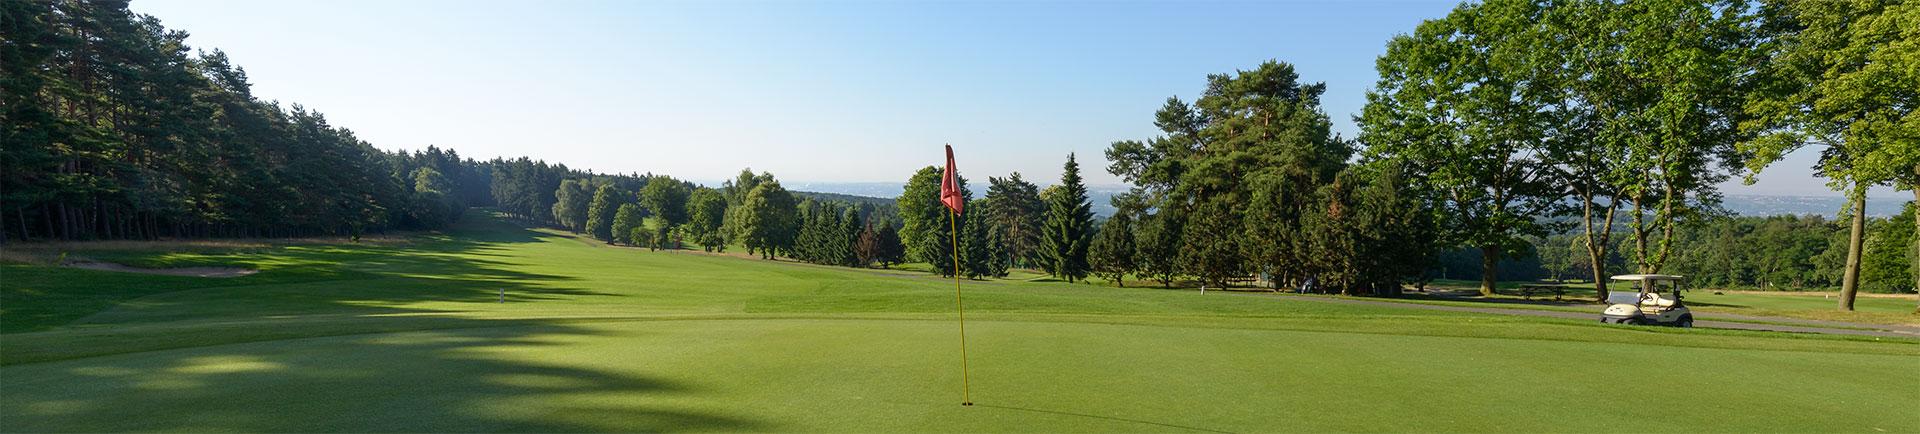 rheinblick-golfcourse-21